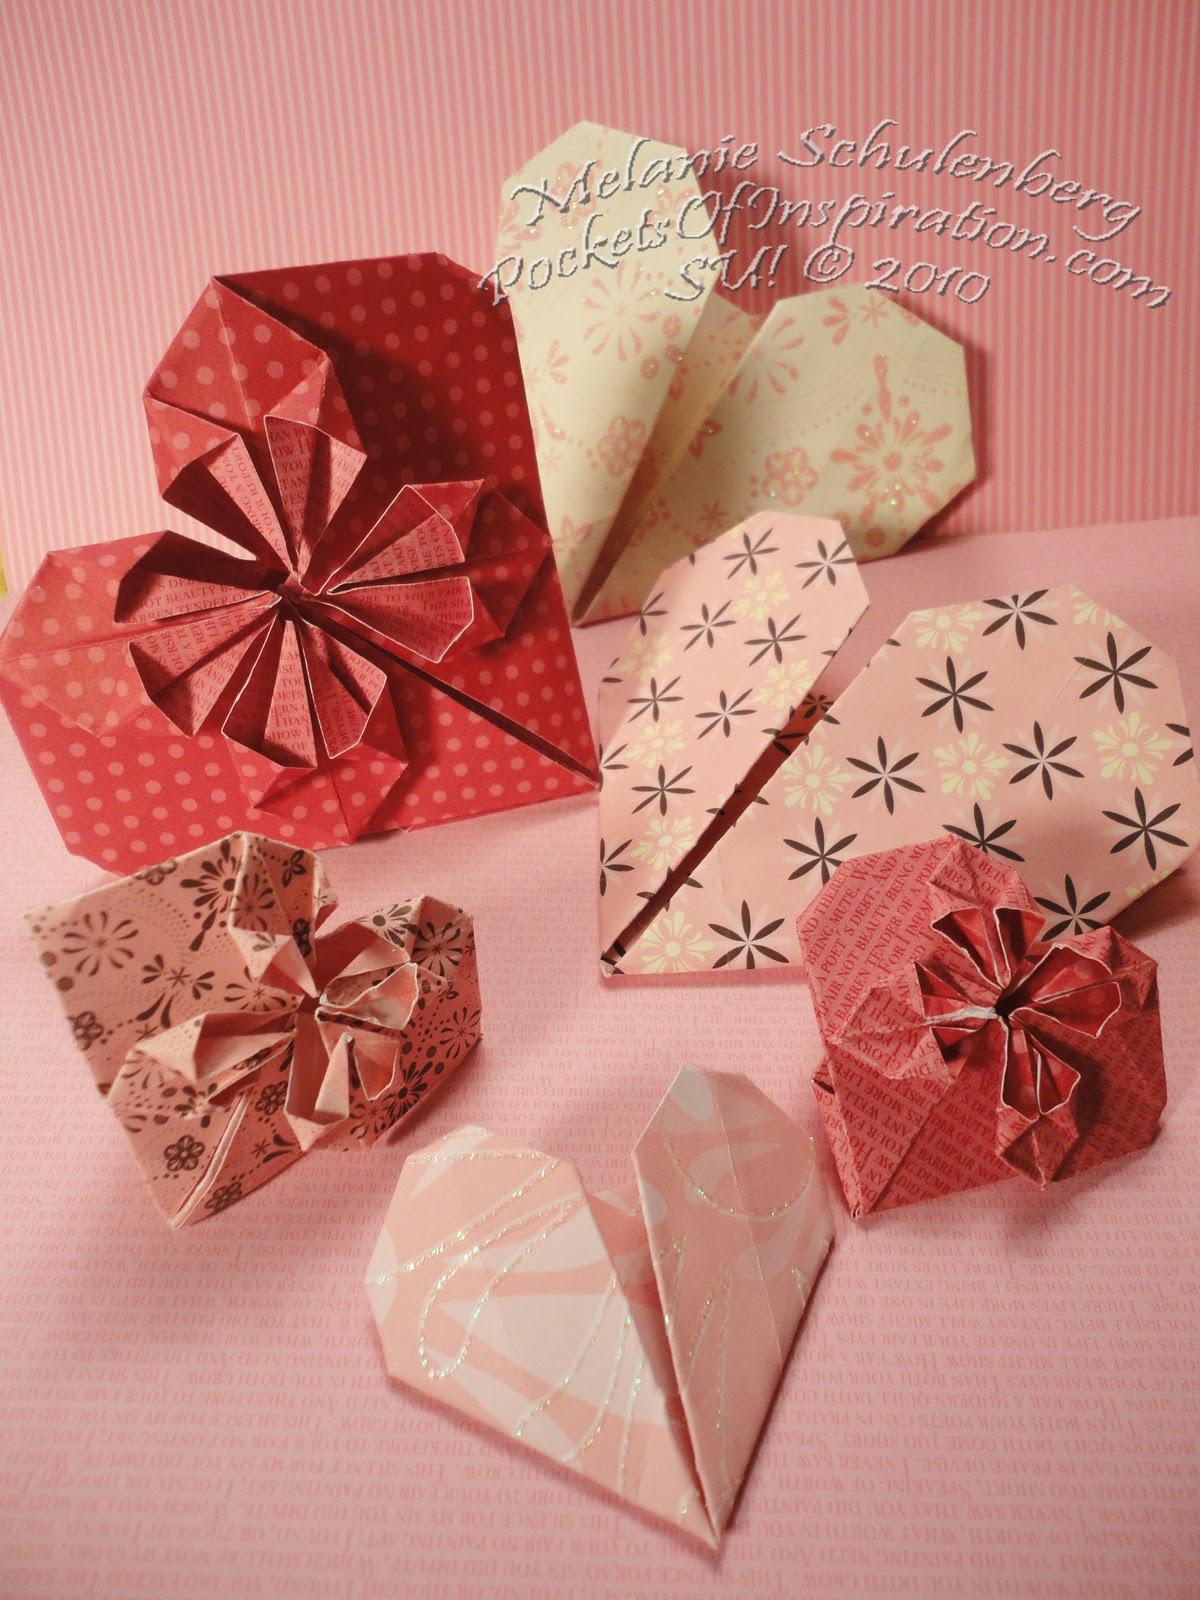 Pockets of Inspiration: The Folded Heart